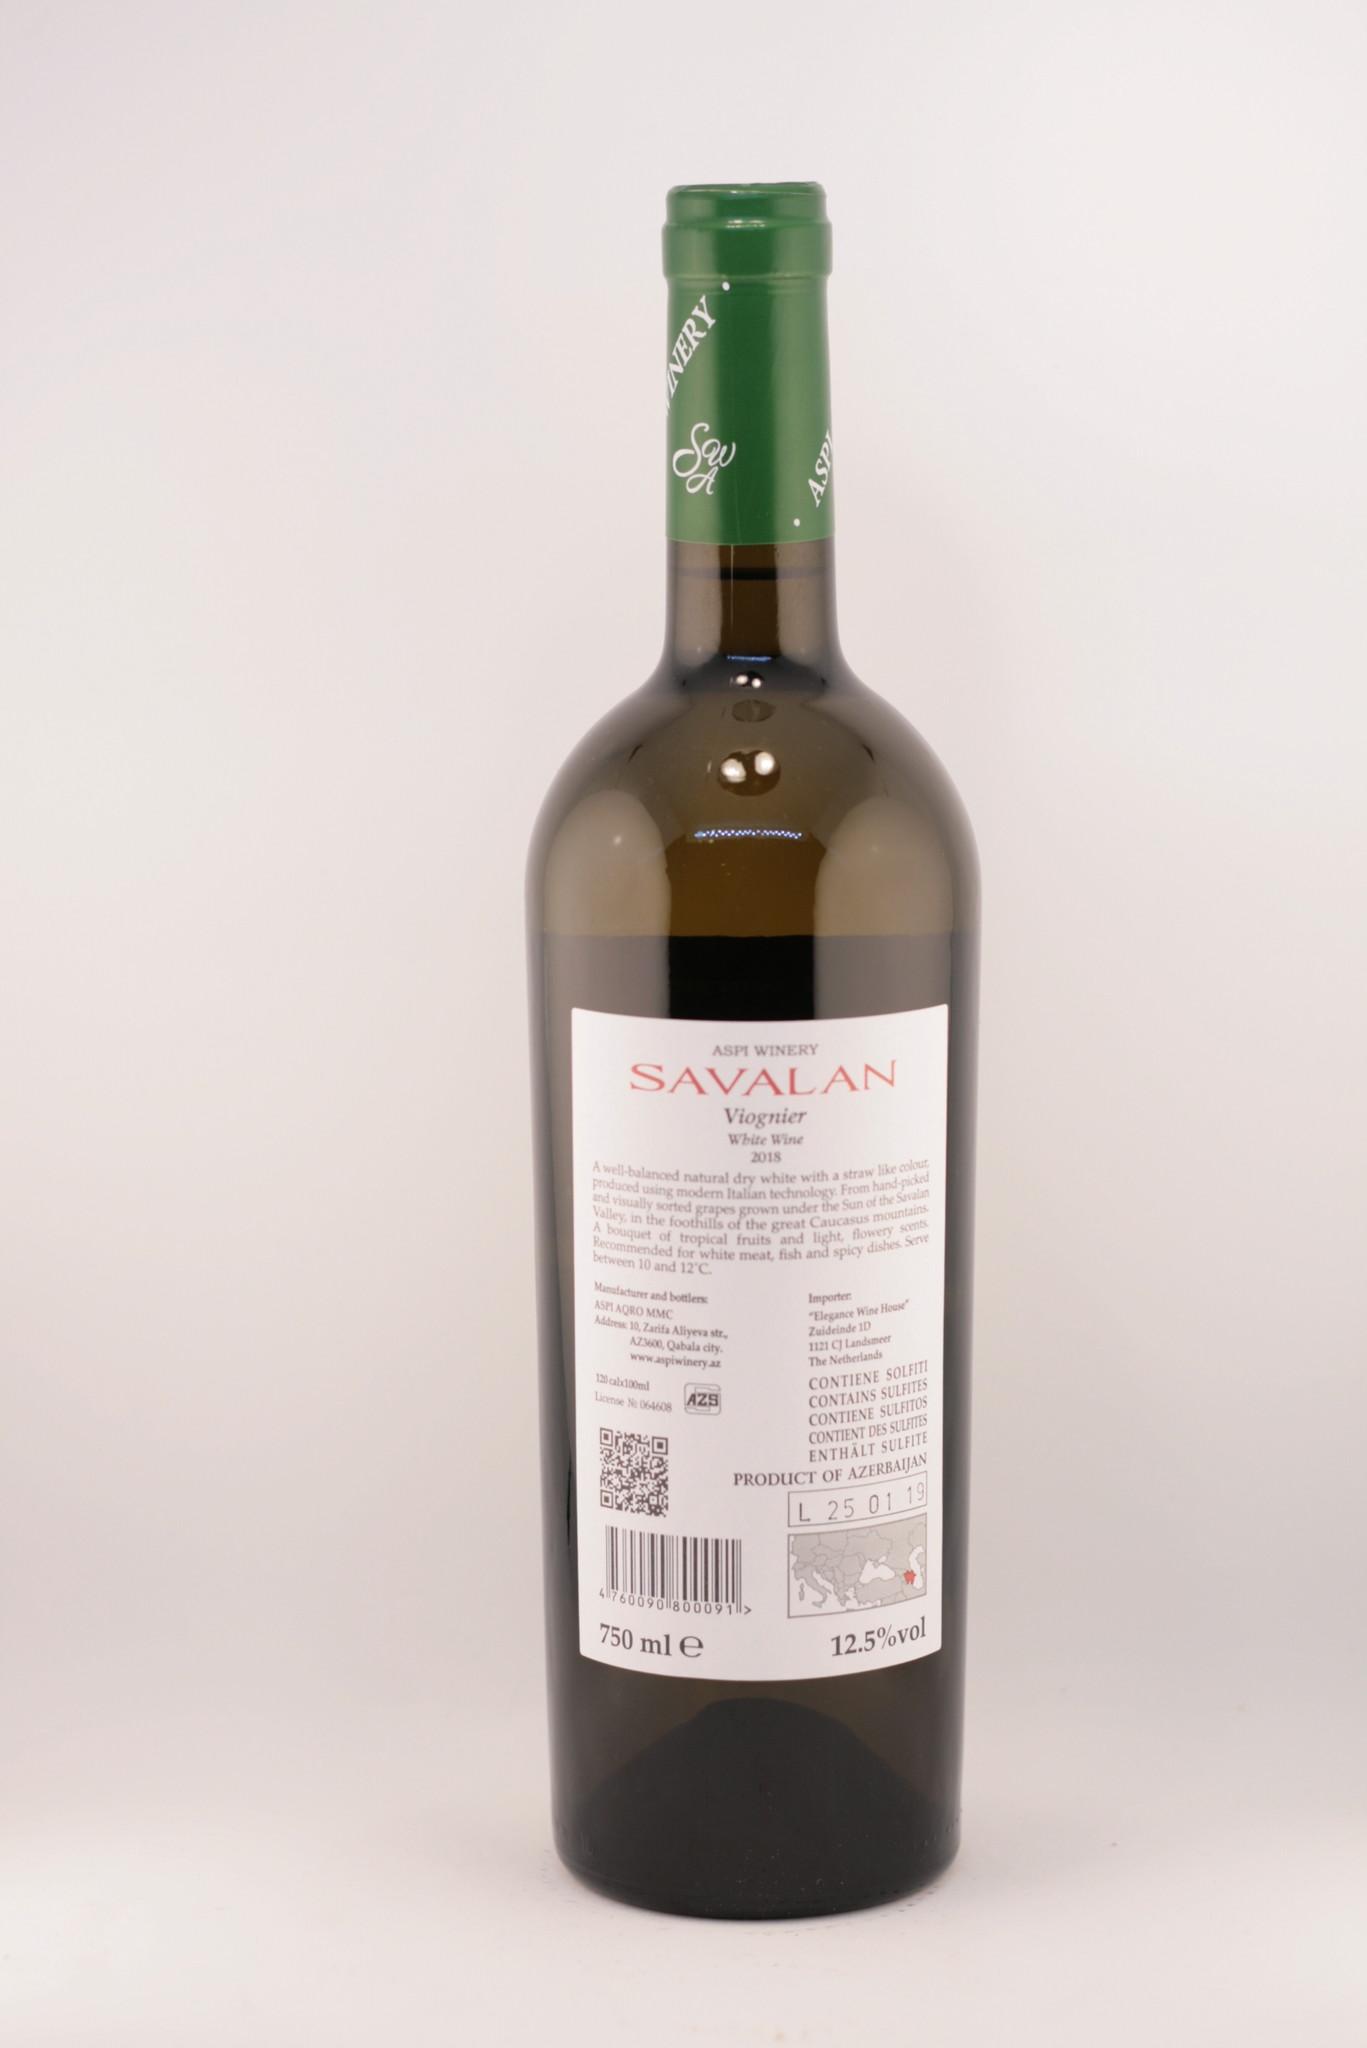 Savalan | Viognier | White dry | 2018